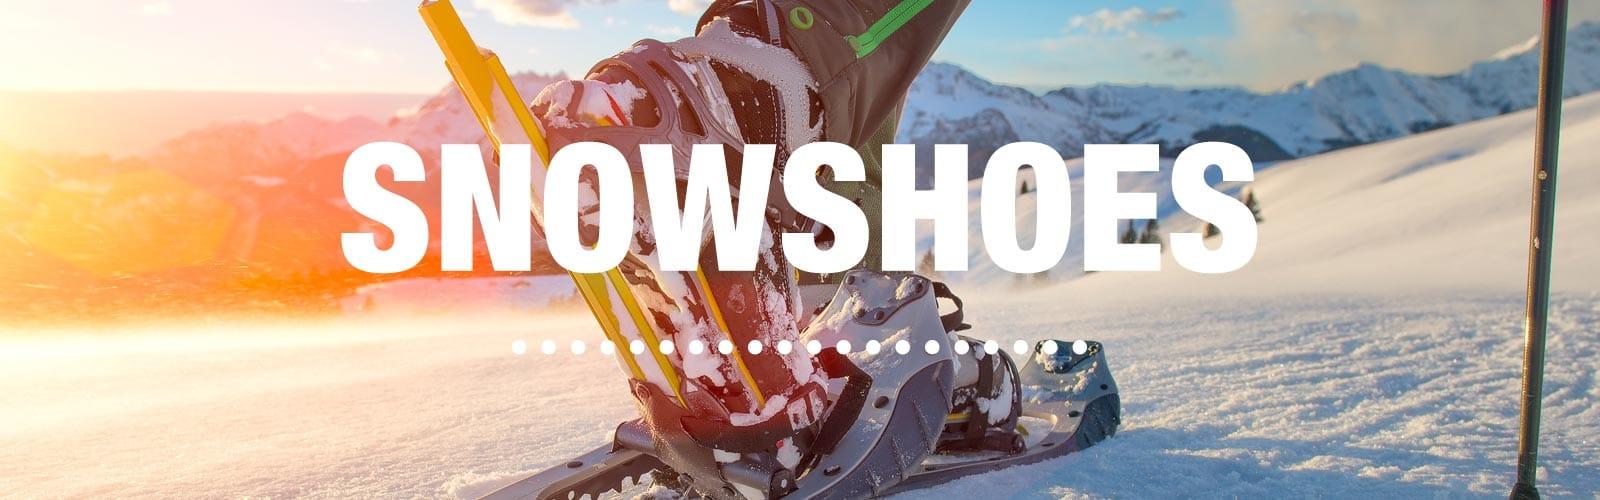 Snowshoe Guide